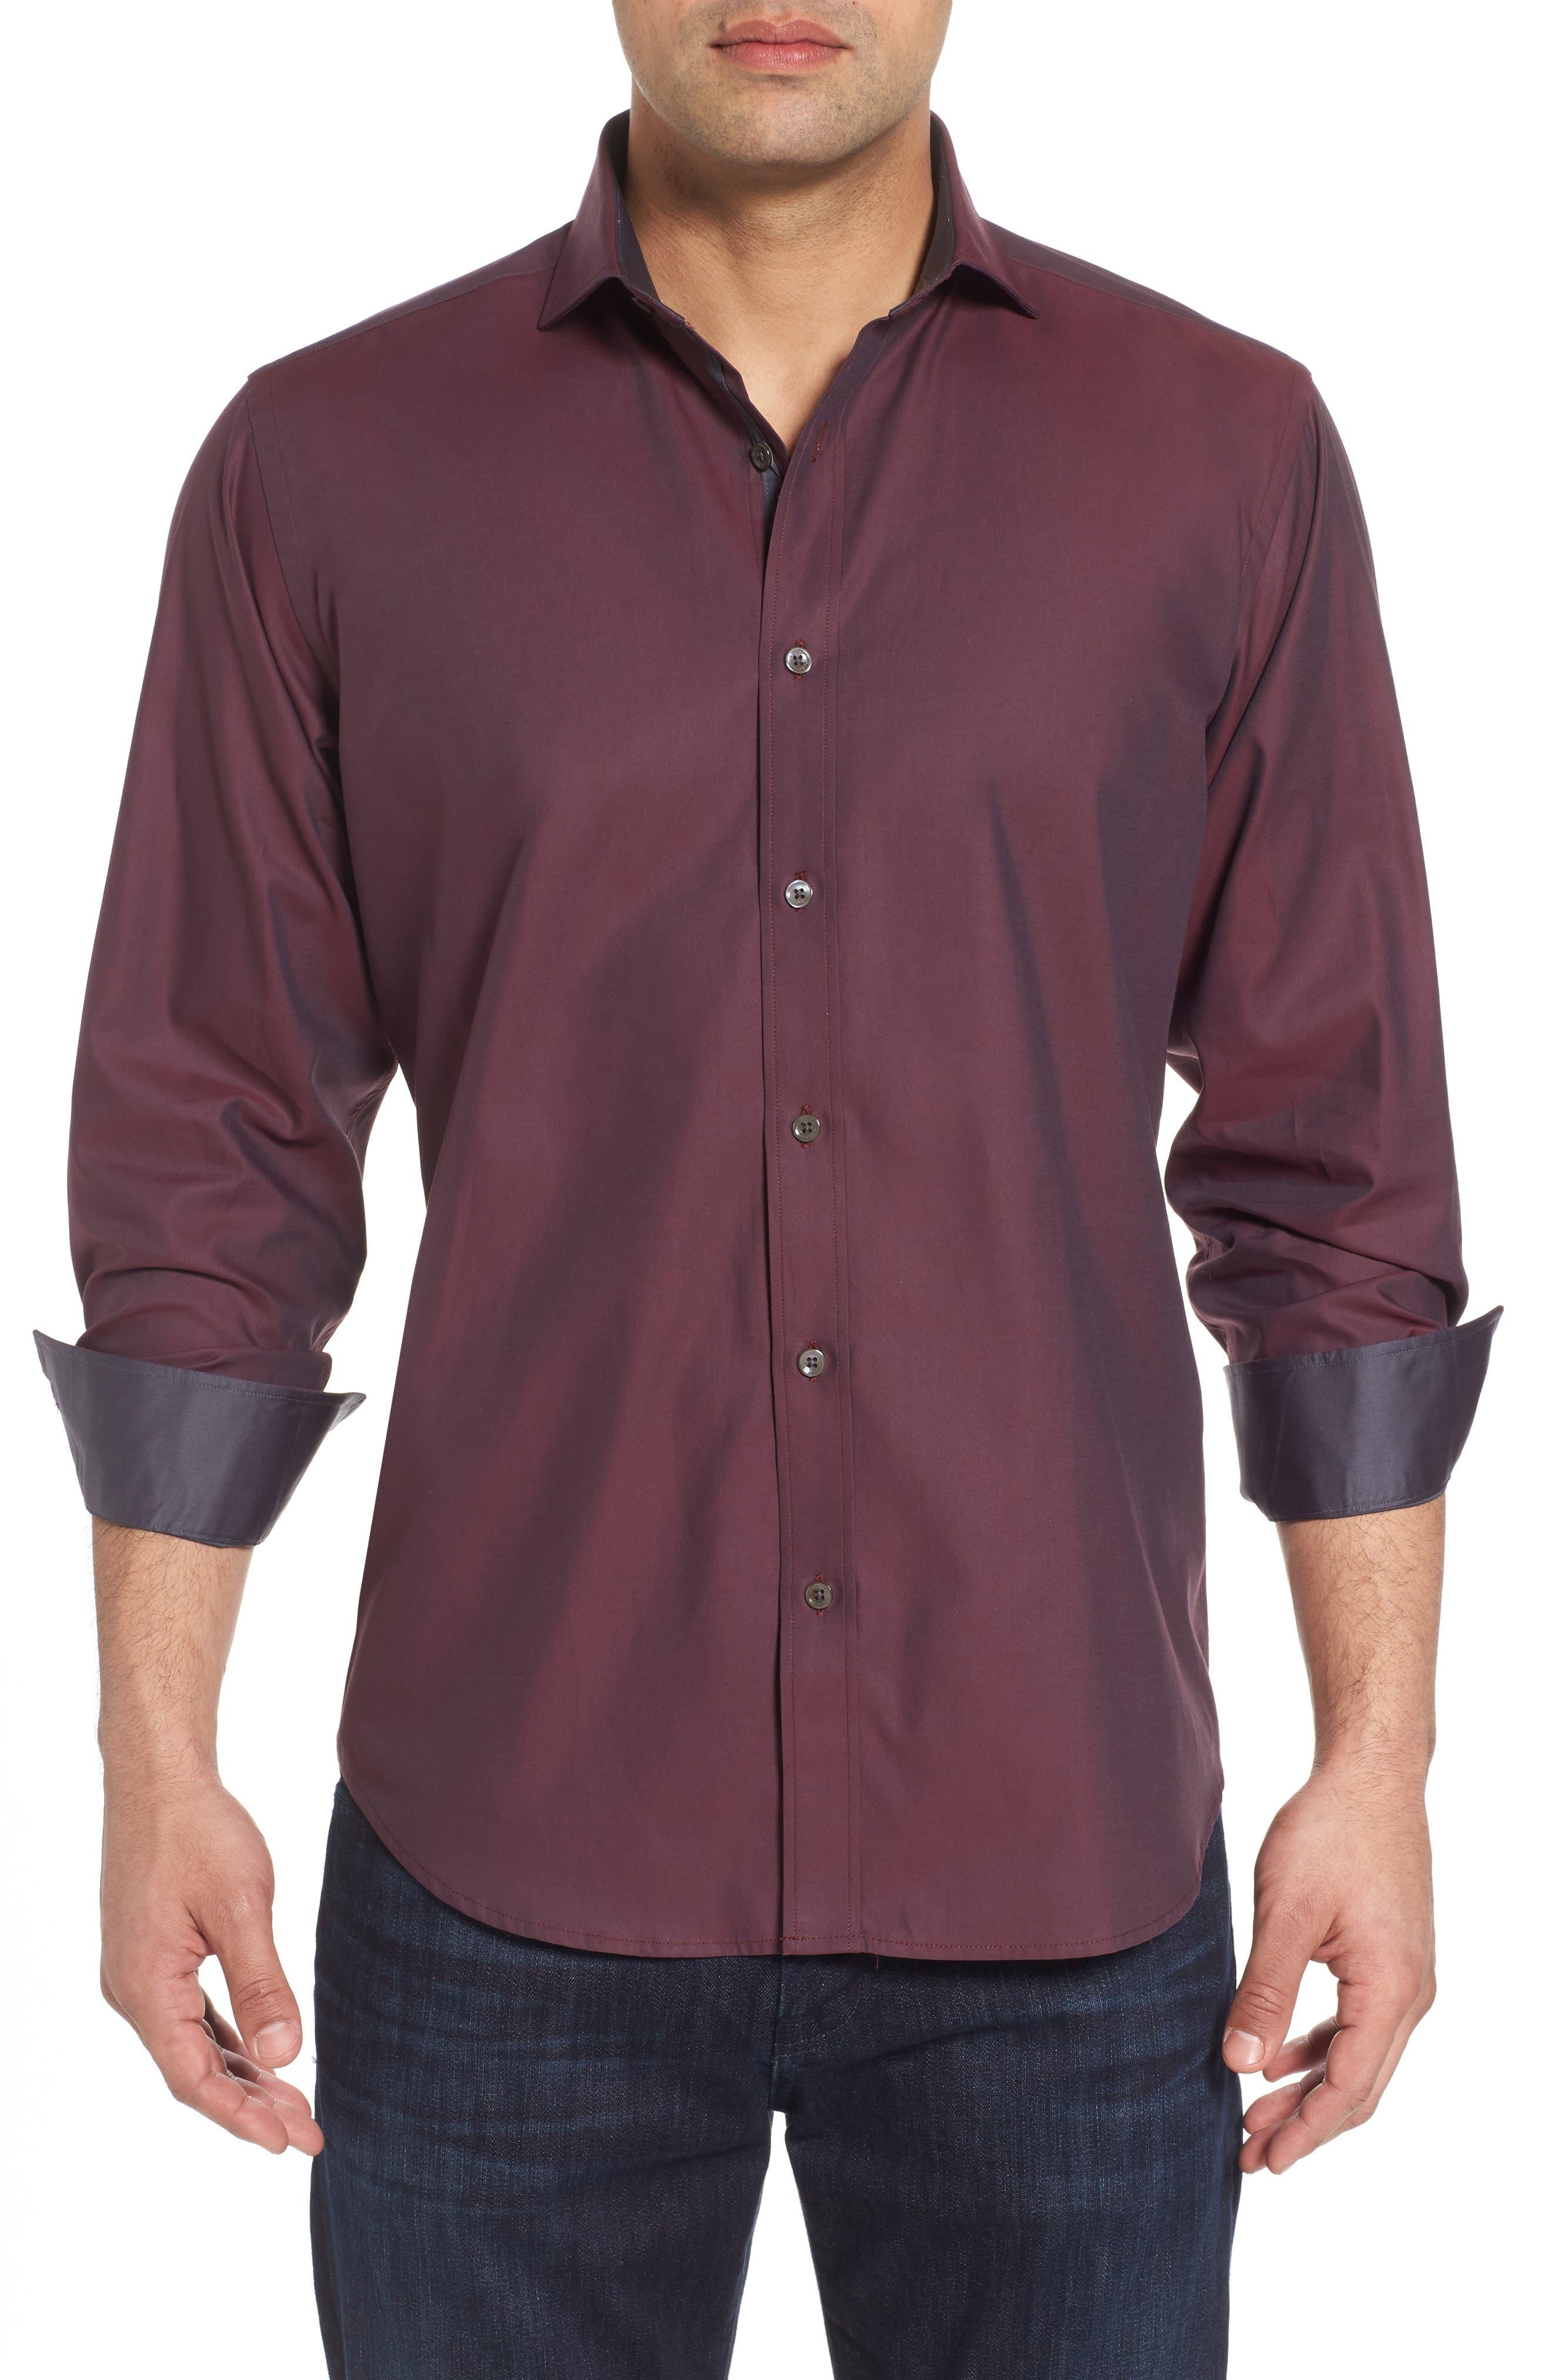 Main Image - Bugatchi Classic Fit Solid Mercerized Cotton Sport Shirt